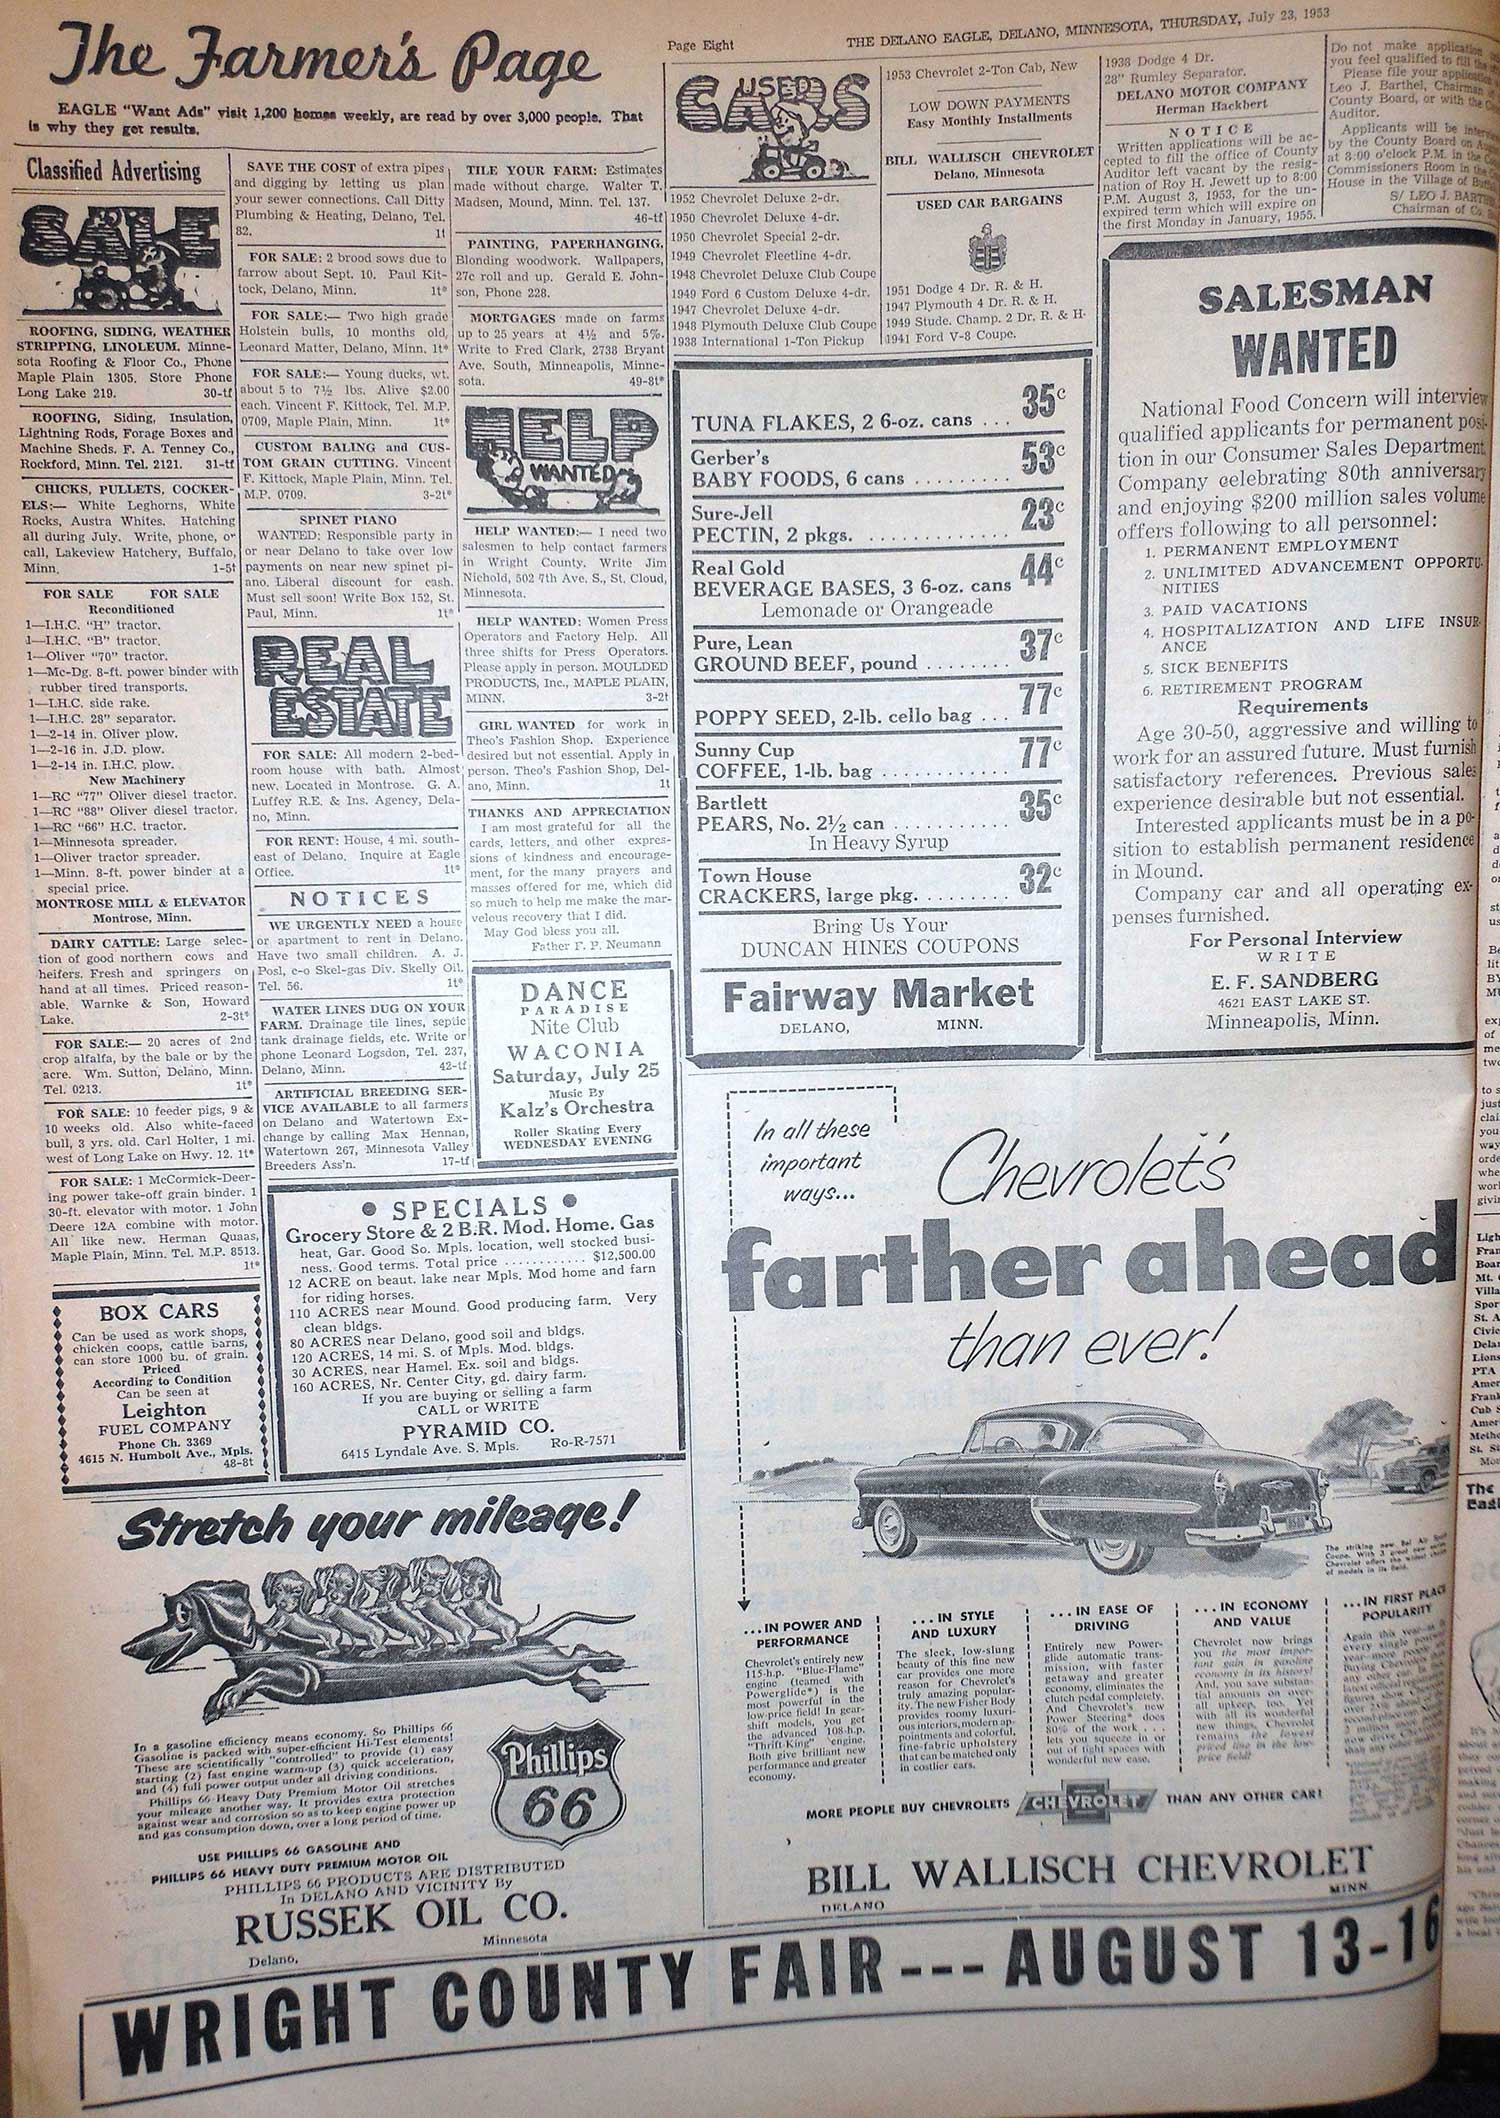 7/23/1953, p8